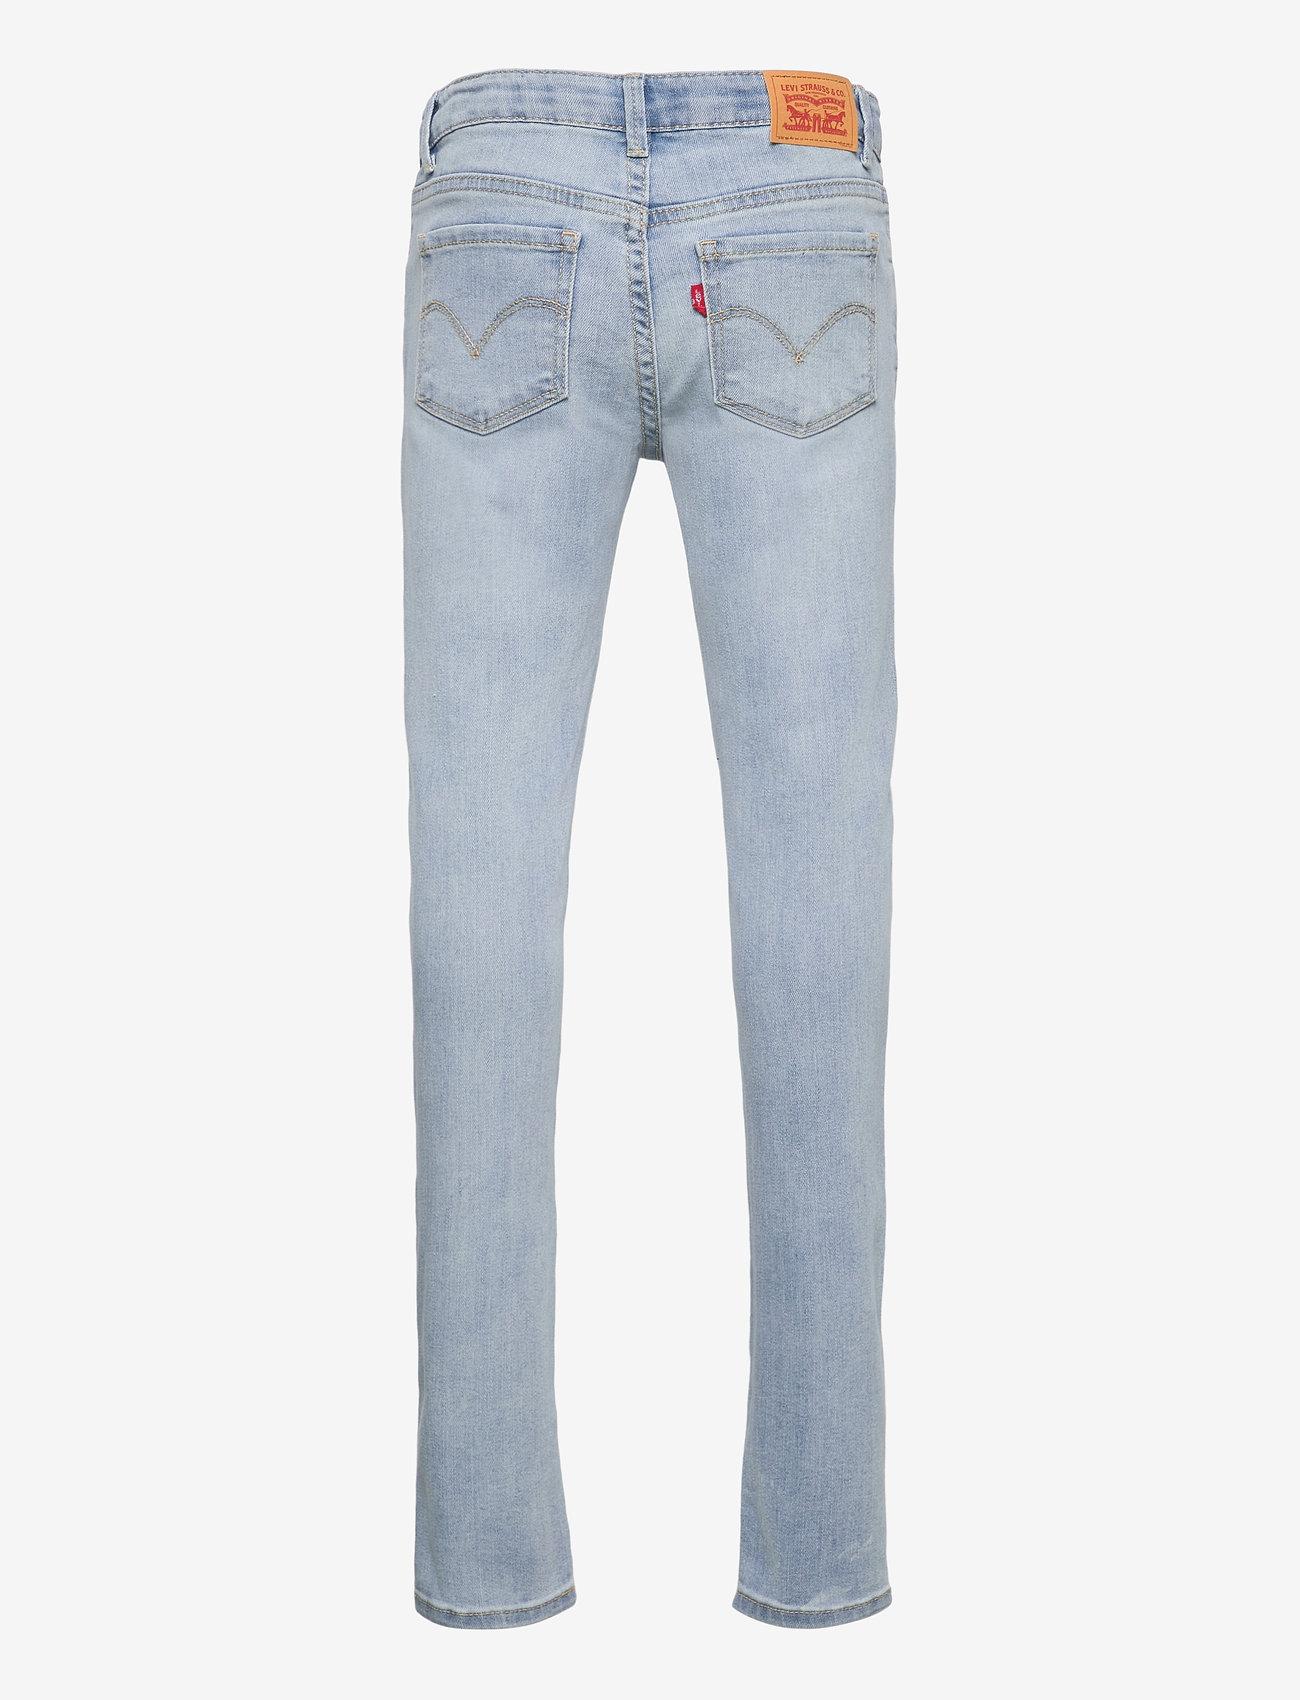 Levi's - 710 SUPER SKINNY JEAN - jeans - spring returns - 1